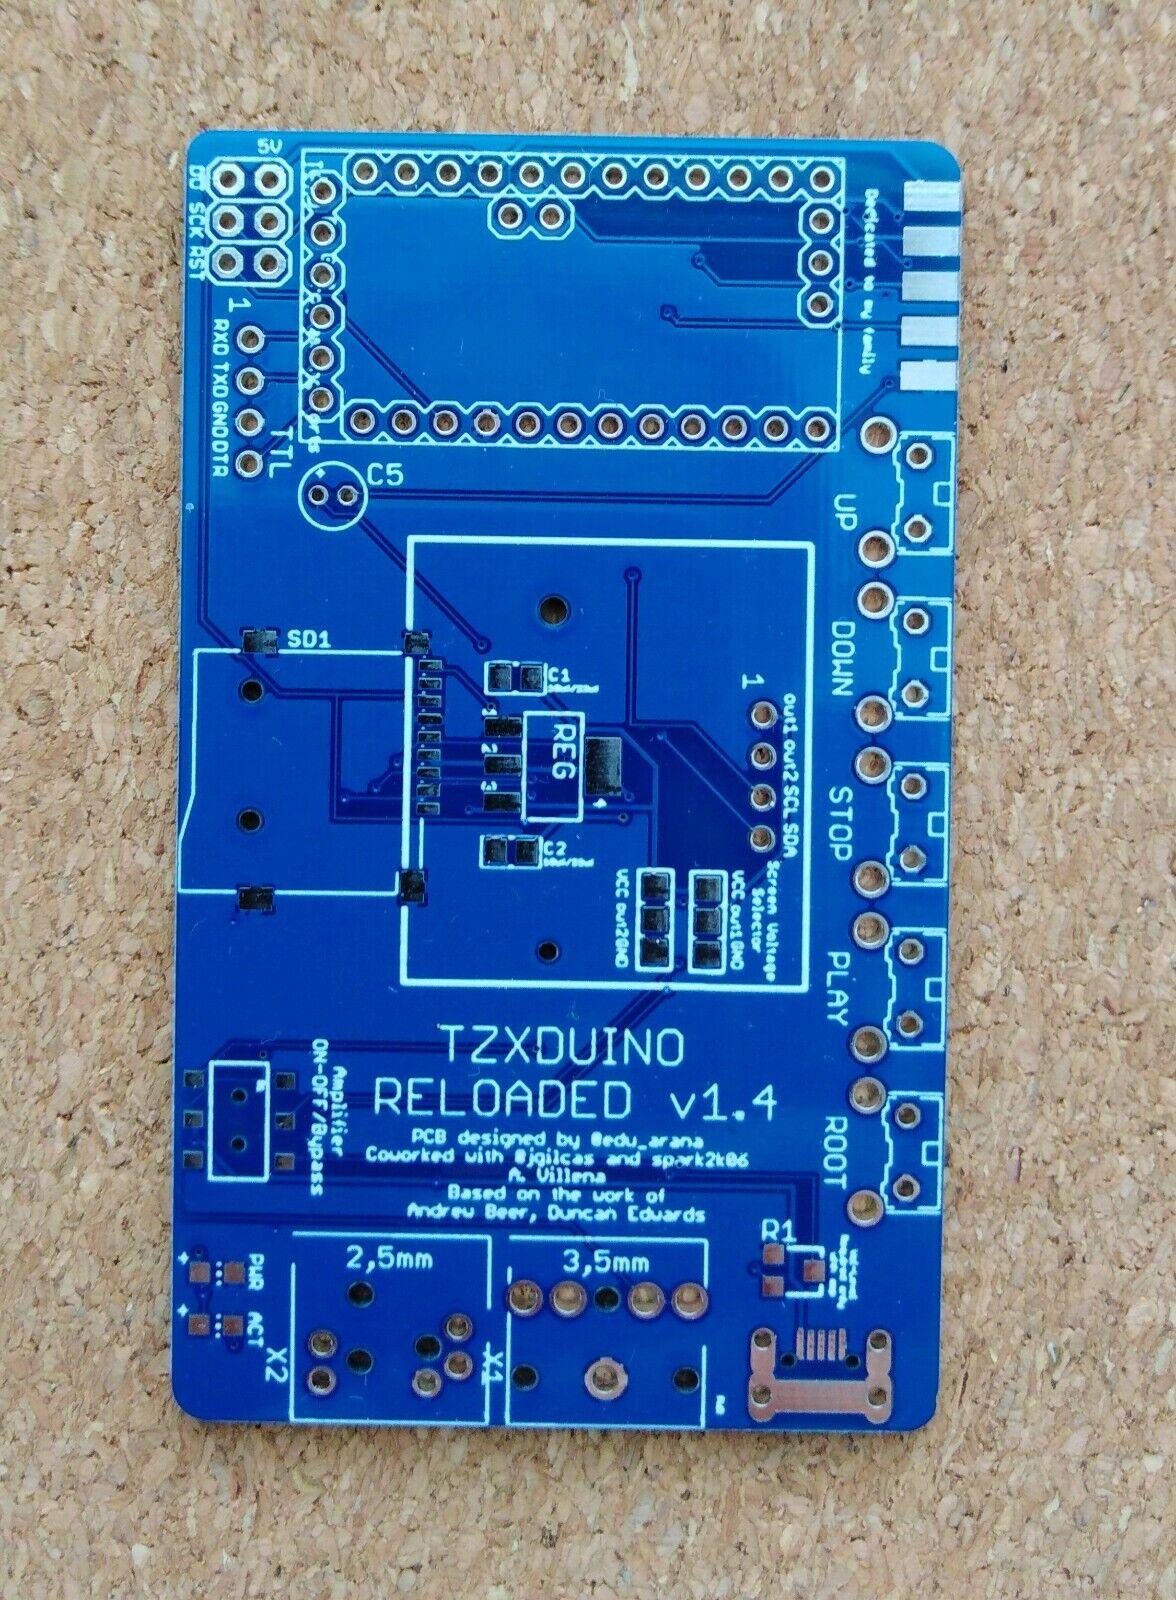  TZXDUINO Reloaded PCB rev1.4